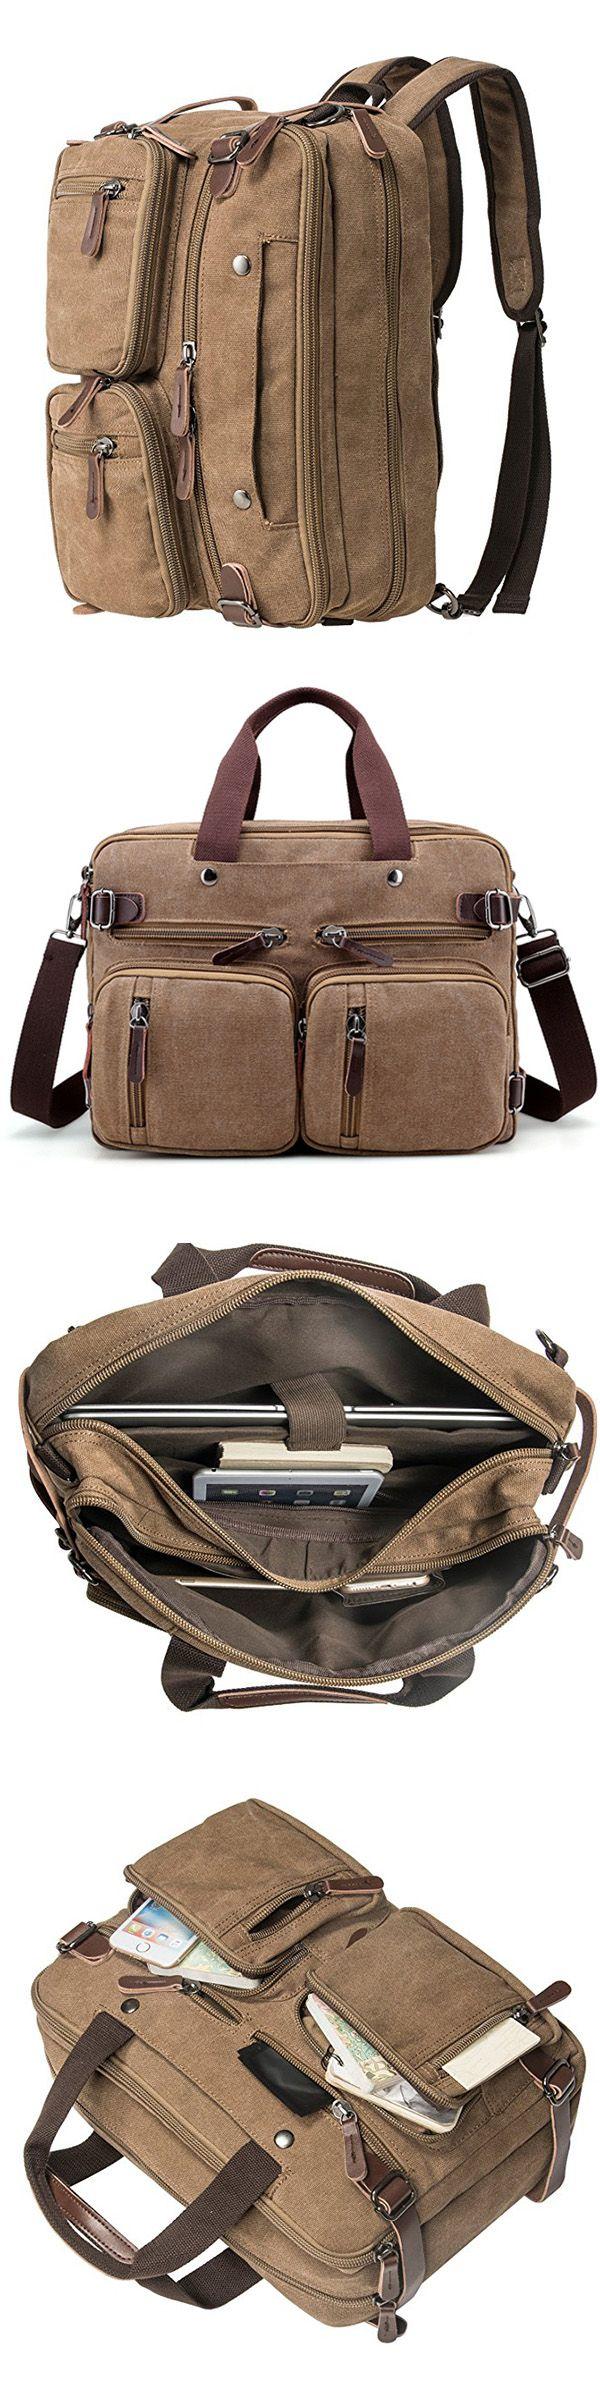 US$32.93 Ekphero Multi Use Canvas Crossbody Bag Multi Pocket Solid Backpack Handbag For Men